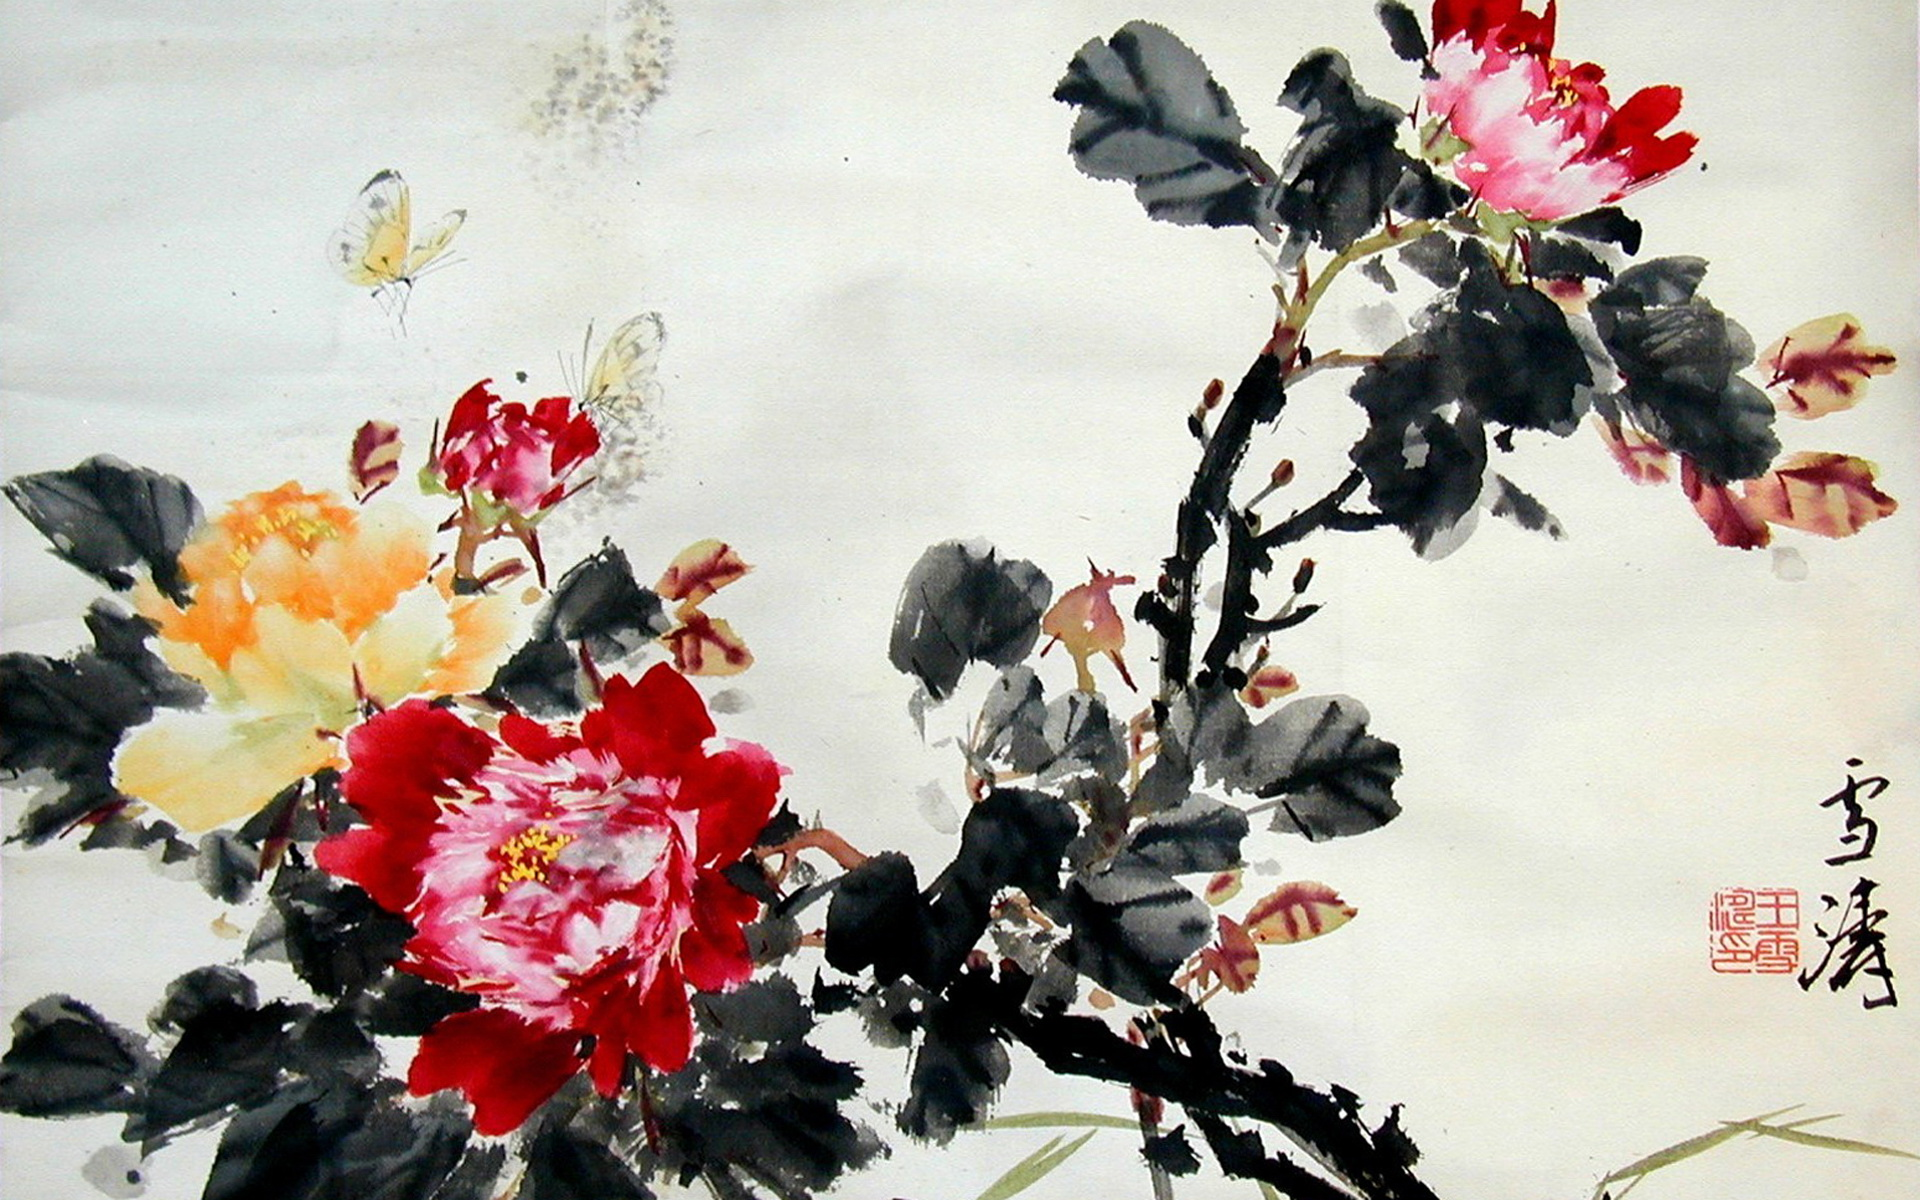 High Resolution Wallpaper | Chinese Artwork 1920x1200 px